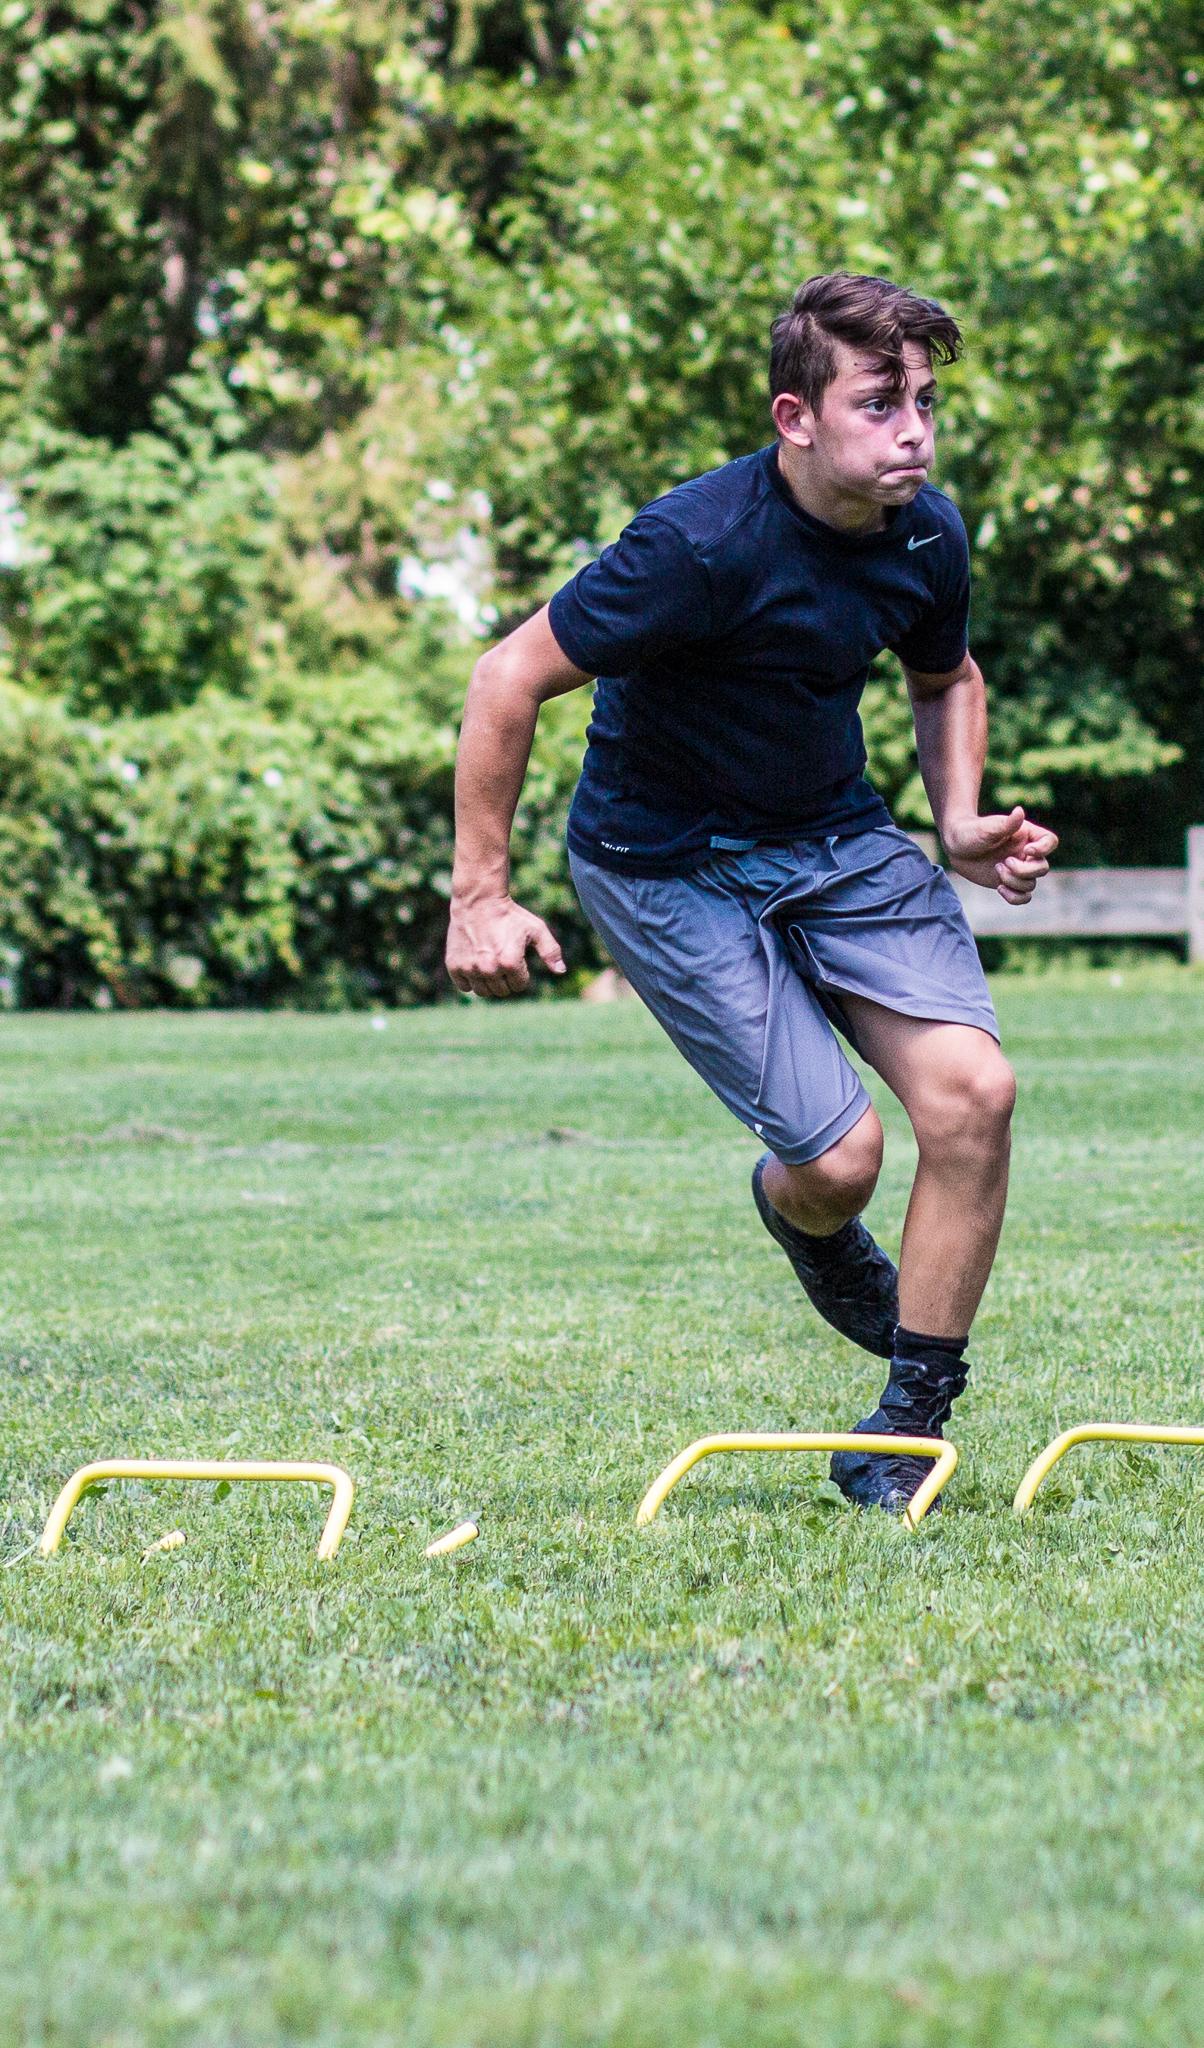 coach-mike-basciano-offseason-training-football-high-school-college-athletes (104 of 149).jpg